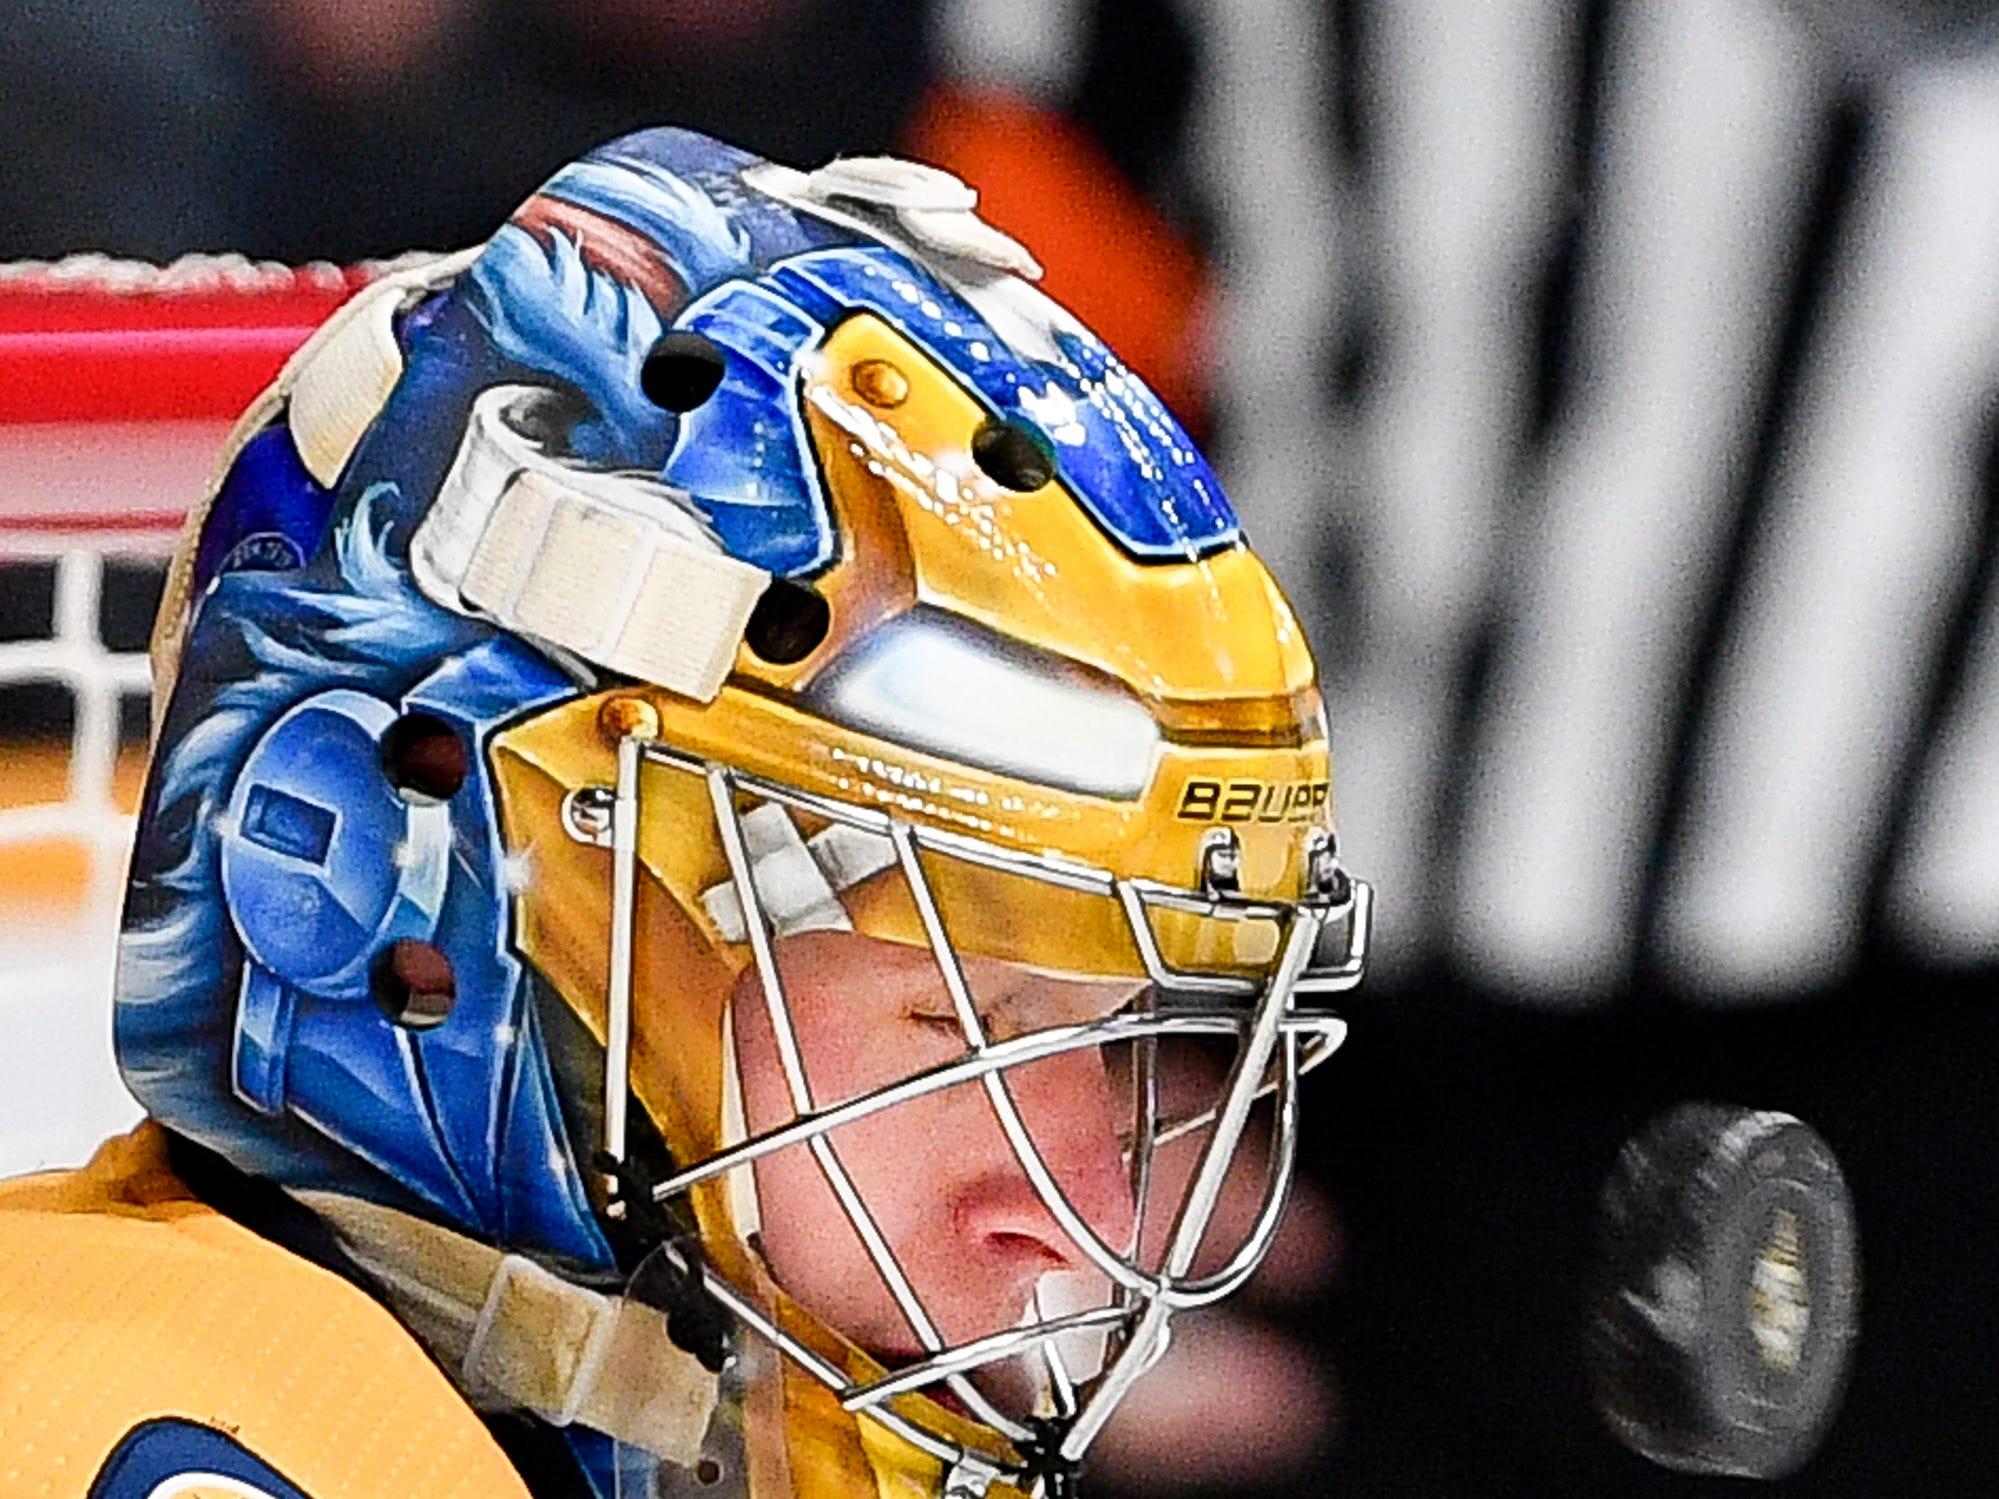 Nashville Predators goaltender Pekka Rinne (35) blocks a Buffalo Sabres shot during the second period at Bridgestone Arena in Nashville, Tenn., Monday, Dec. 3, 2018.